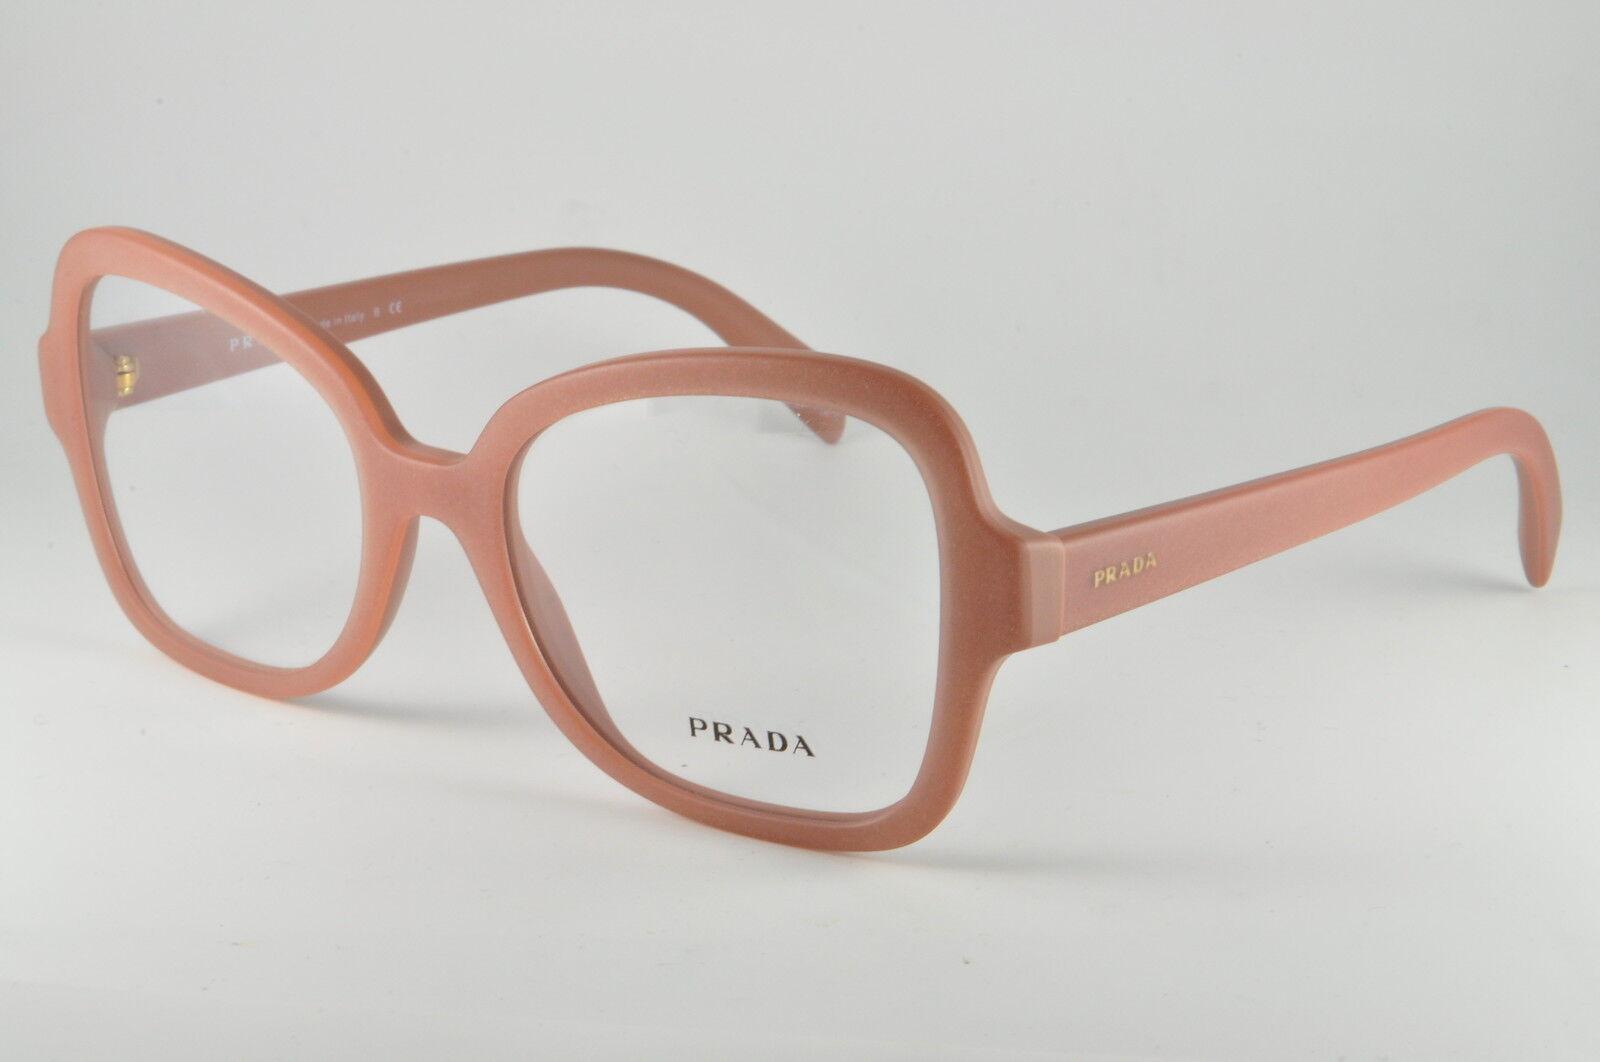 d276a1969a1 inexpensive prada eyeglasses vpr 25s uff 1o1 matte aluminum pink size 51 18  135 0d016 6c7bf